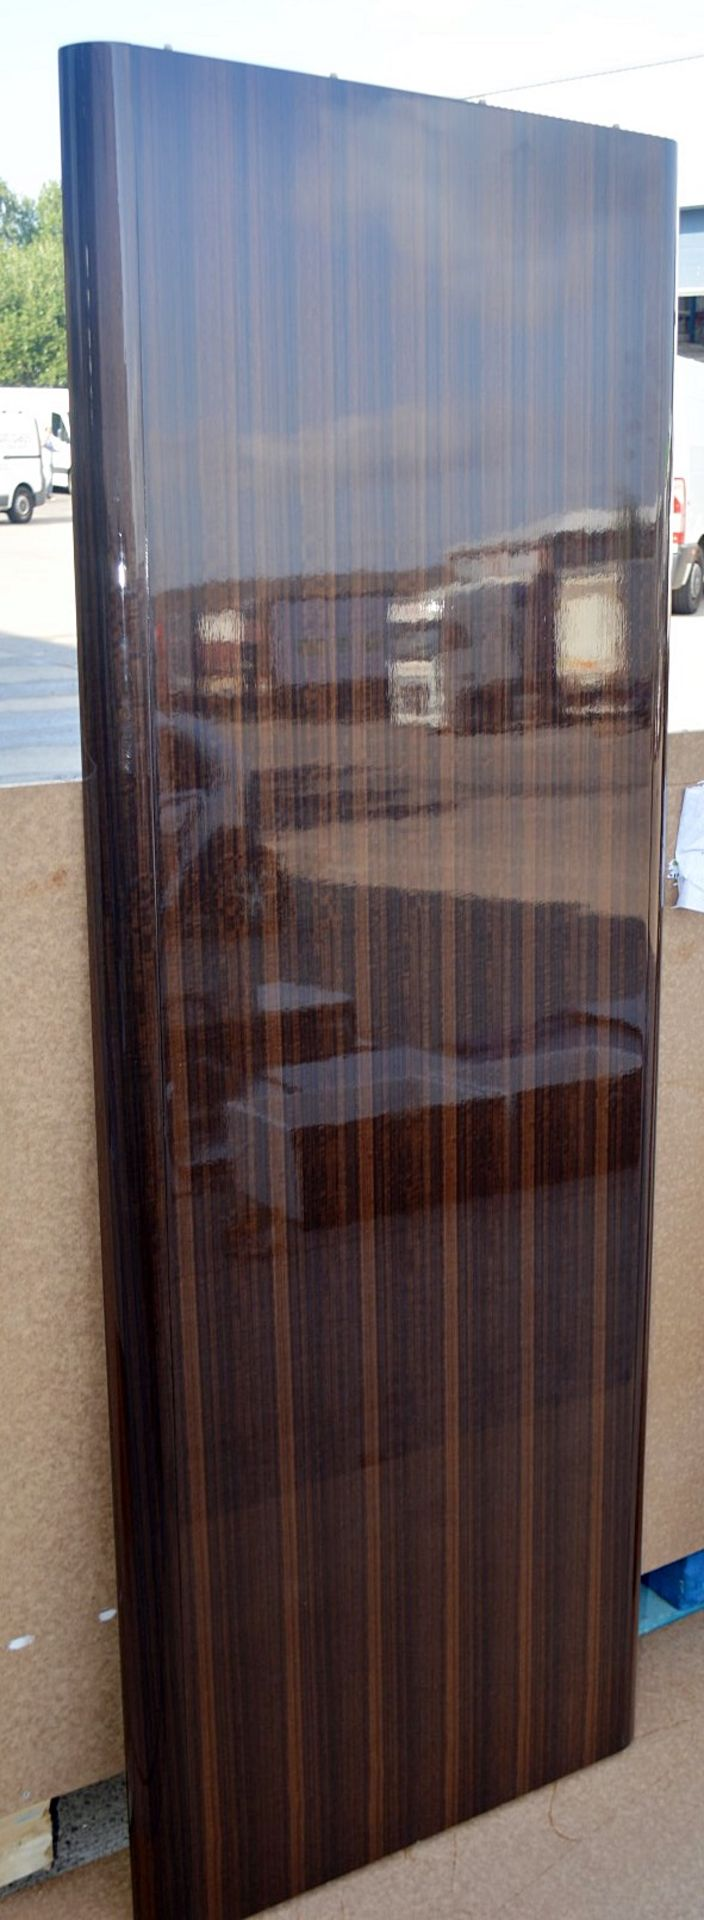 1 x FRATO Bespoke 'Siena' Wardrobe With A High Gloss Brown Wood Veneer Finish - Original RRP £18,890 - Image 4 of 21